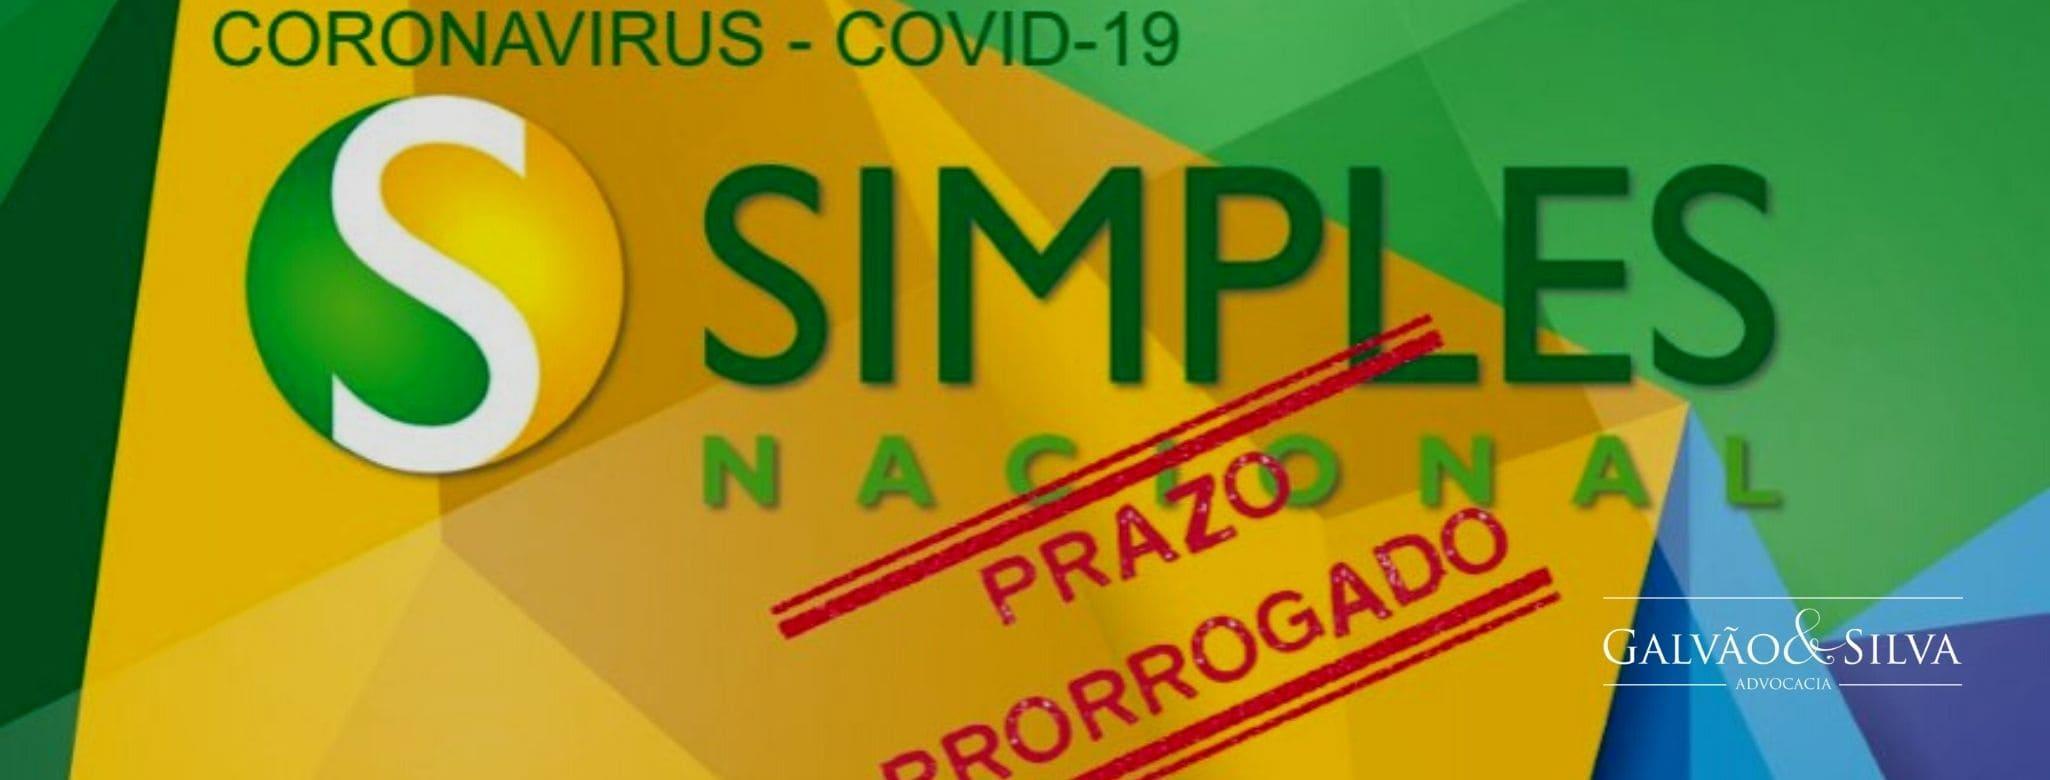 Simples Nacional: Prazo para pagamento foi prorrogado